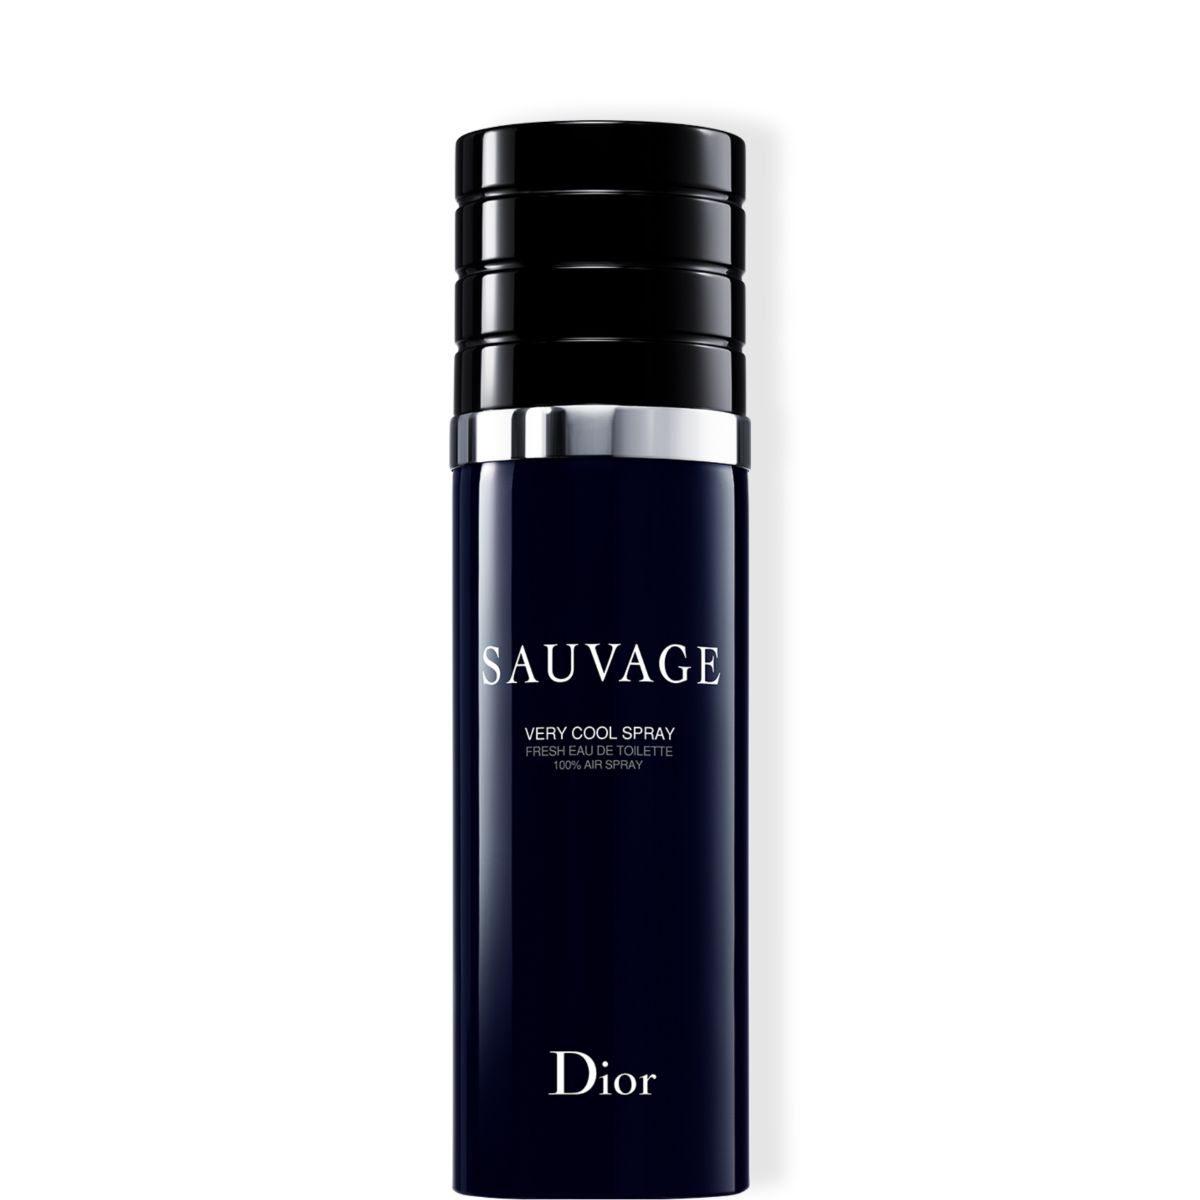 Very Cool Spray Fresh Eau de Toilette Sauvage - DIOR